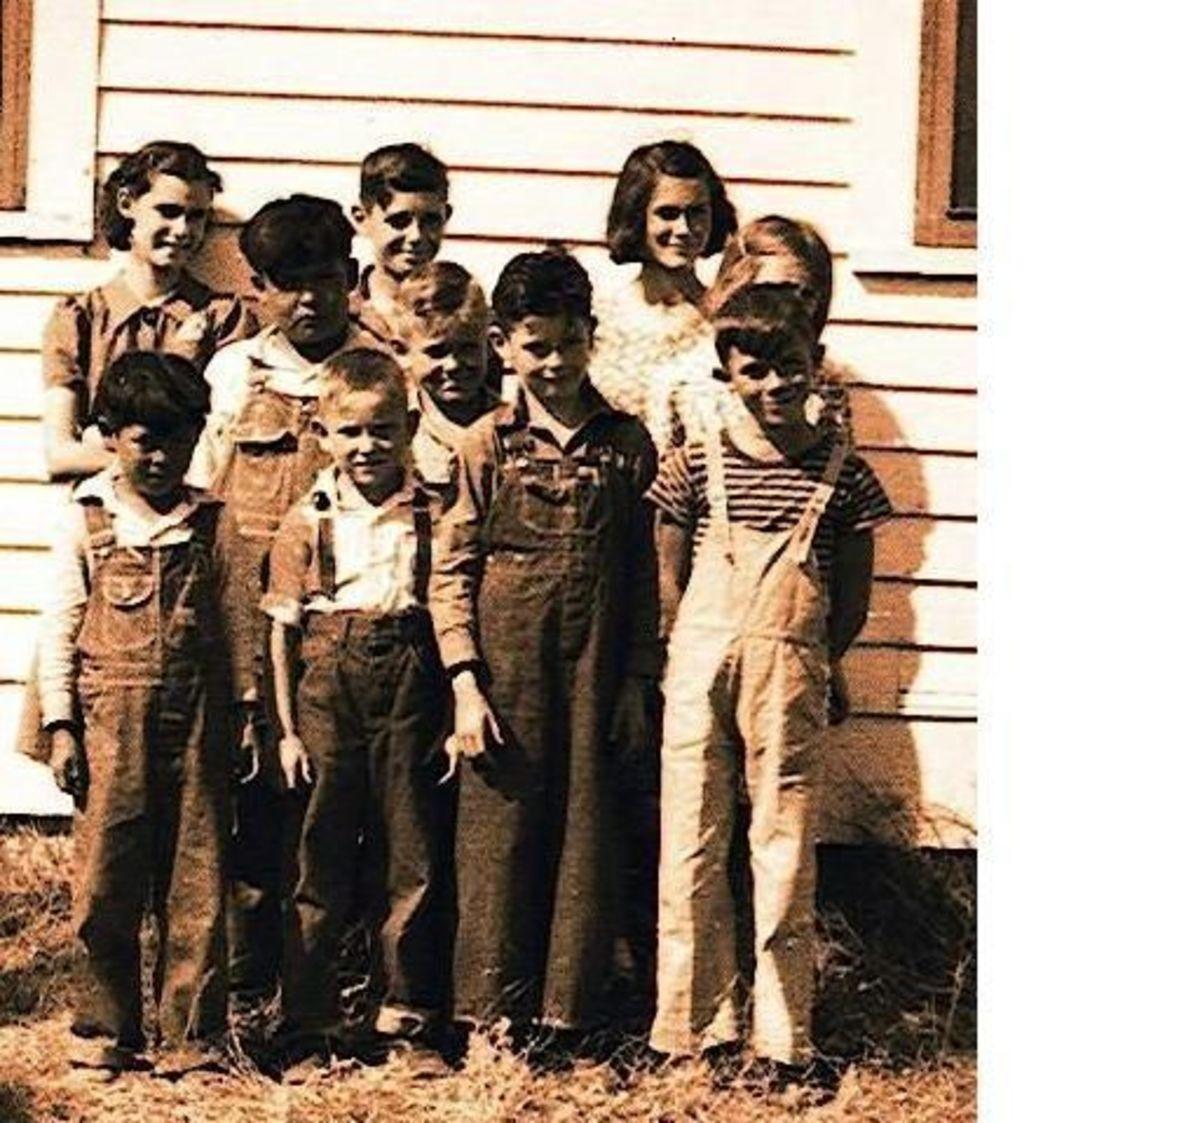 Back Row: Melda Welty, Monte Manka, Barbara Sontag  Middle Row: Manuel Vidrois, Keith Redd, Georgiana Austin (Hidden)  Front Row: Manuel's little brother, Sheldon Redd, Leslie Manka, John Sontag